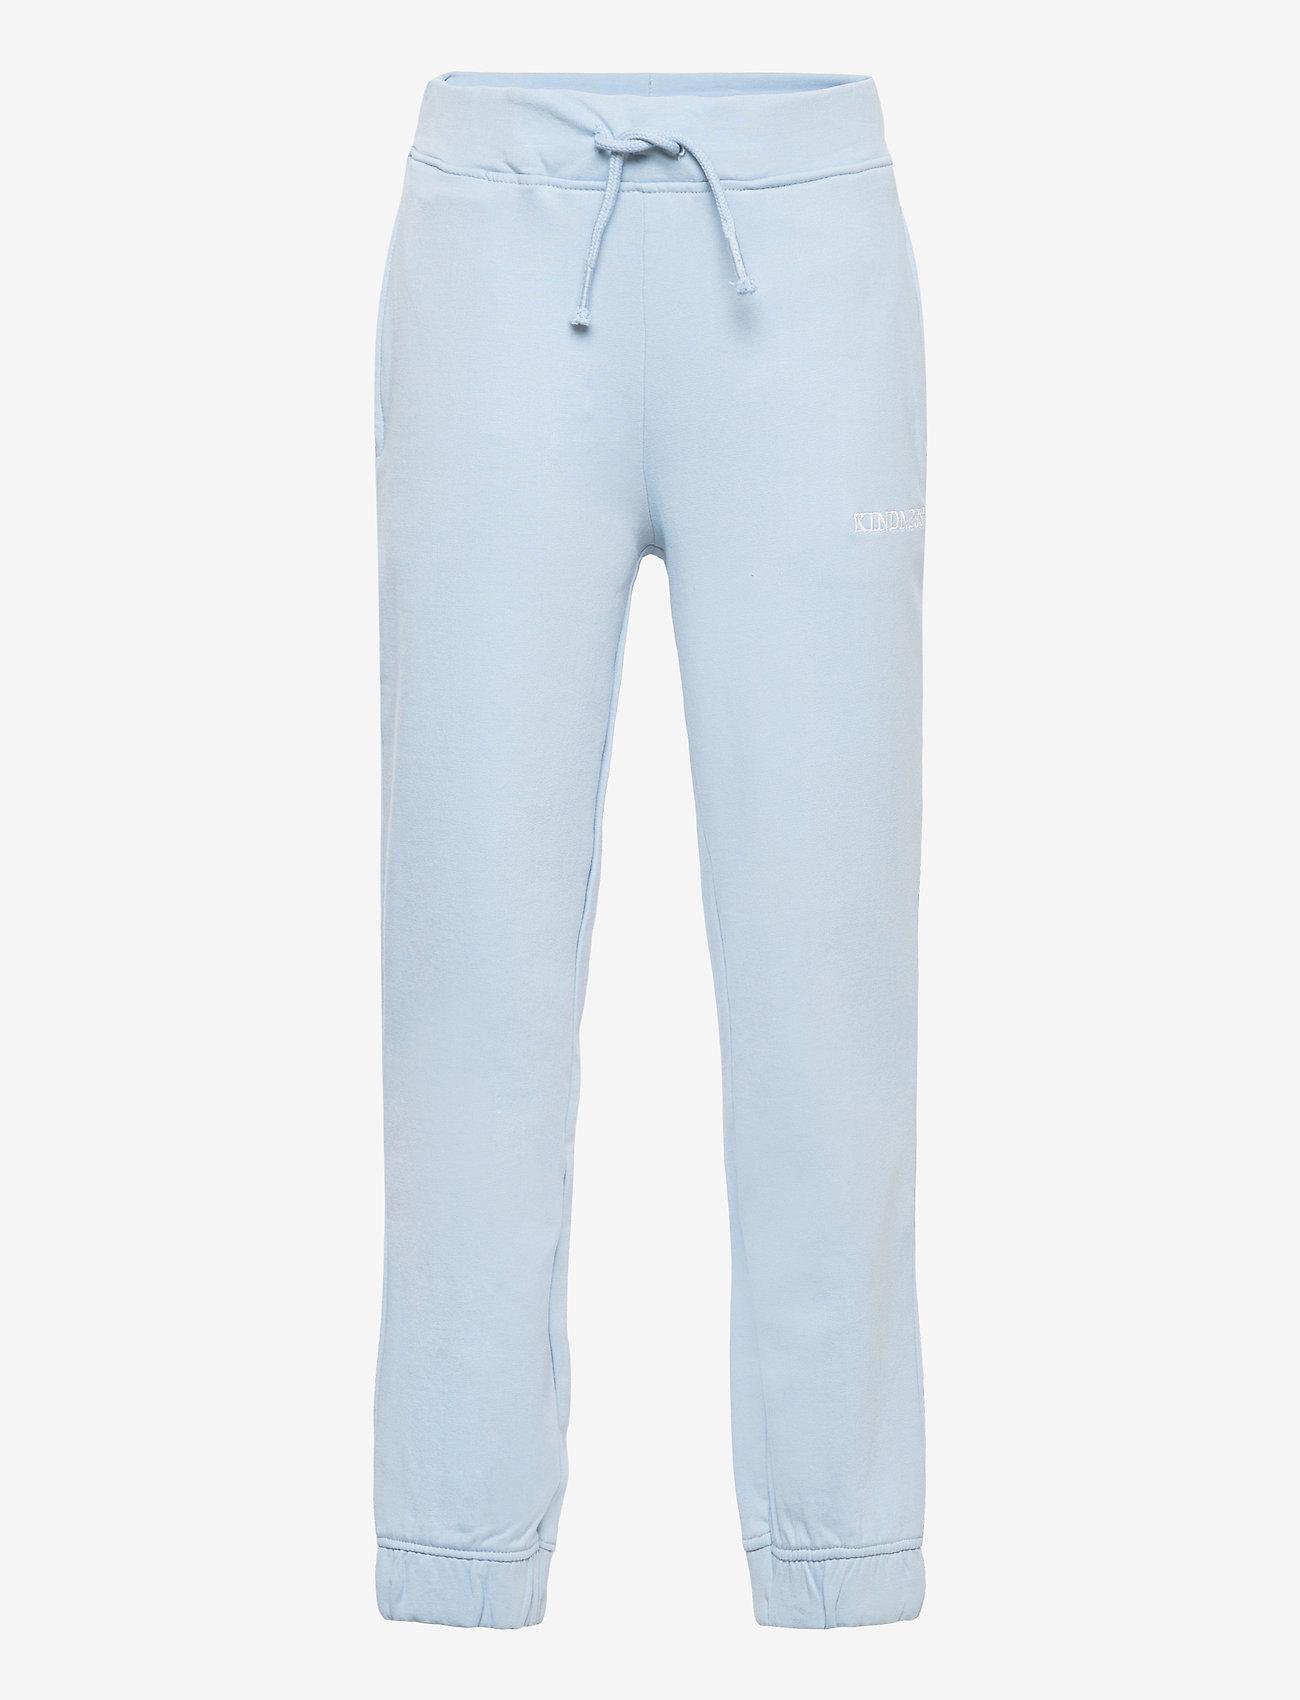 name it - NKFHOWAY SWEAT PANT  BRU - jogginghosen - dusty blue - 0